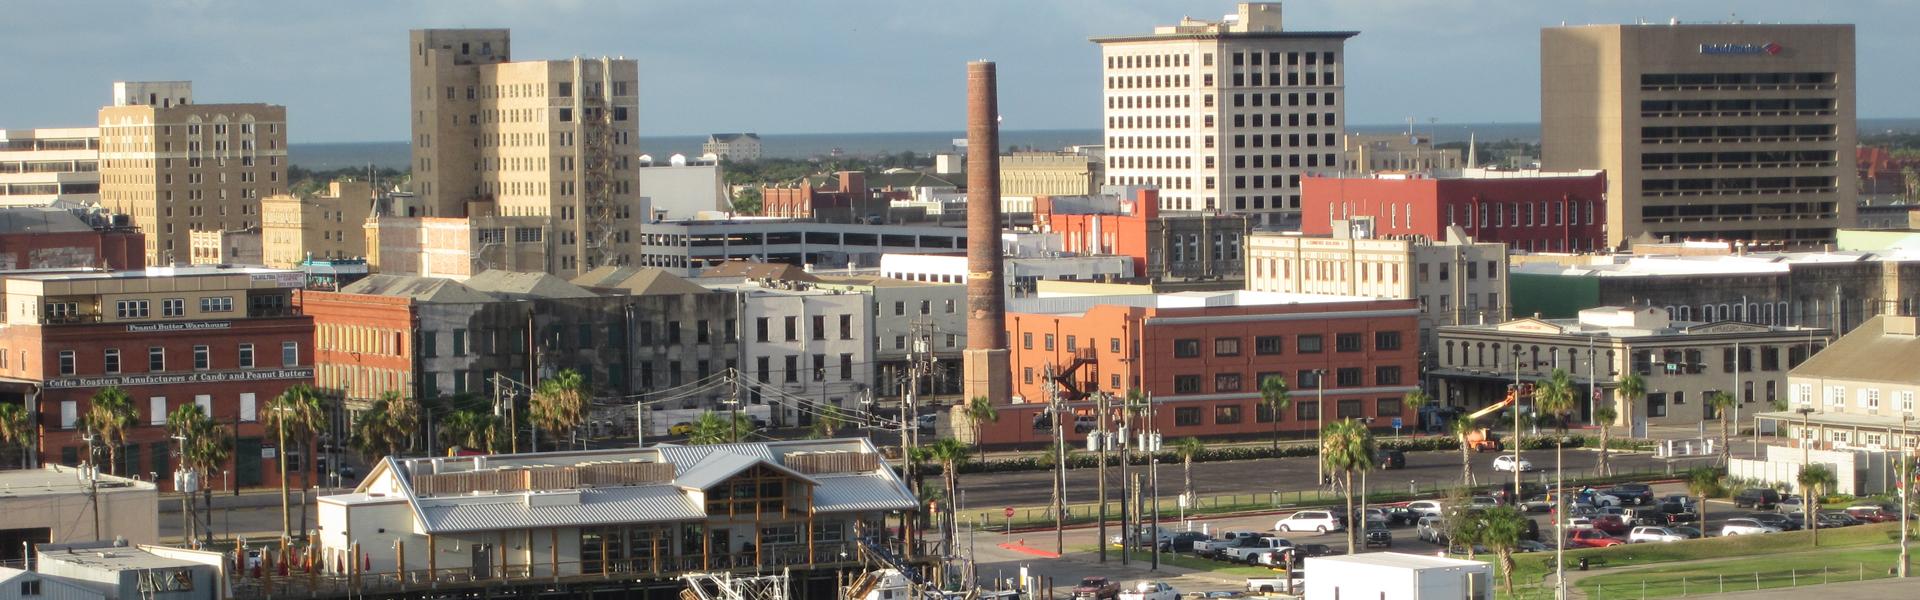 Car Insurance Quotes in Galveston County Texas